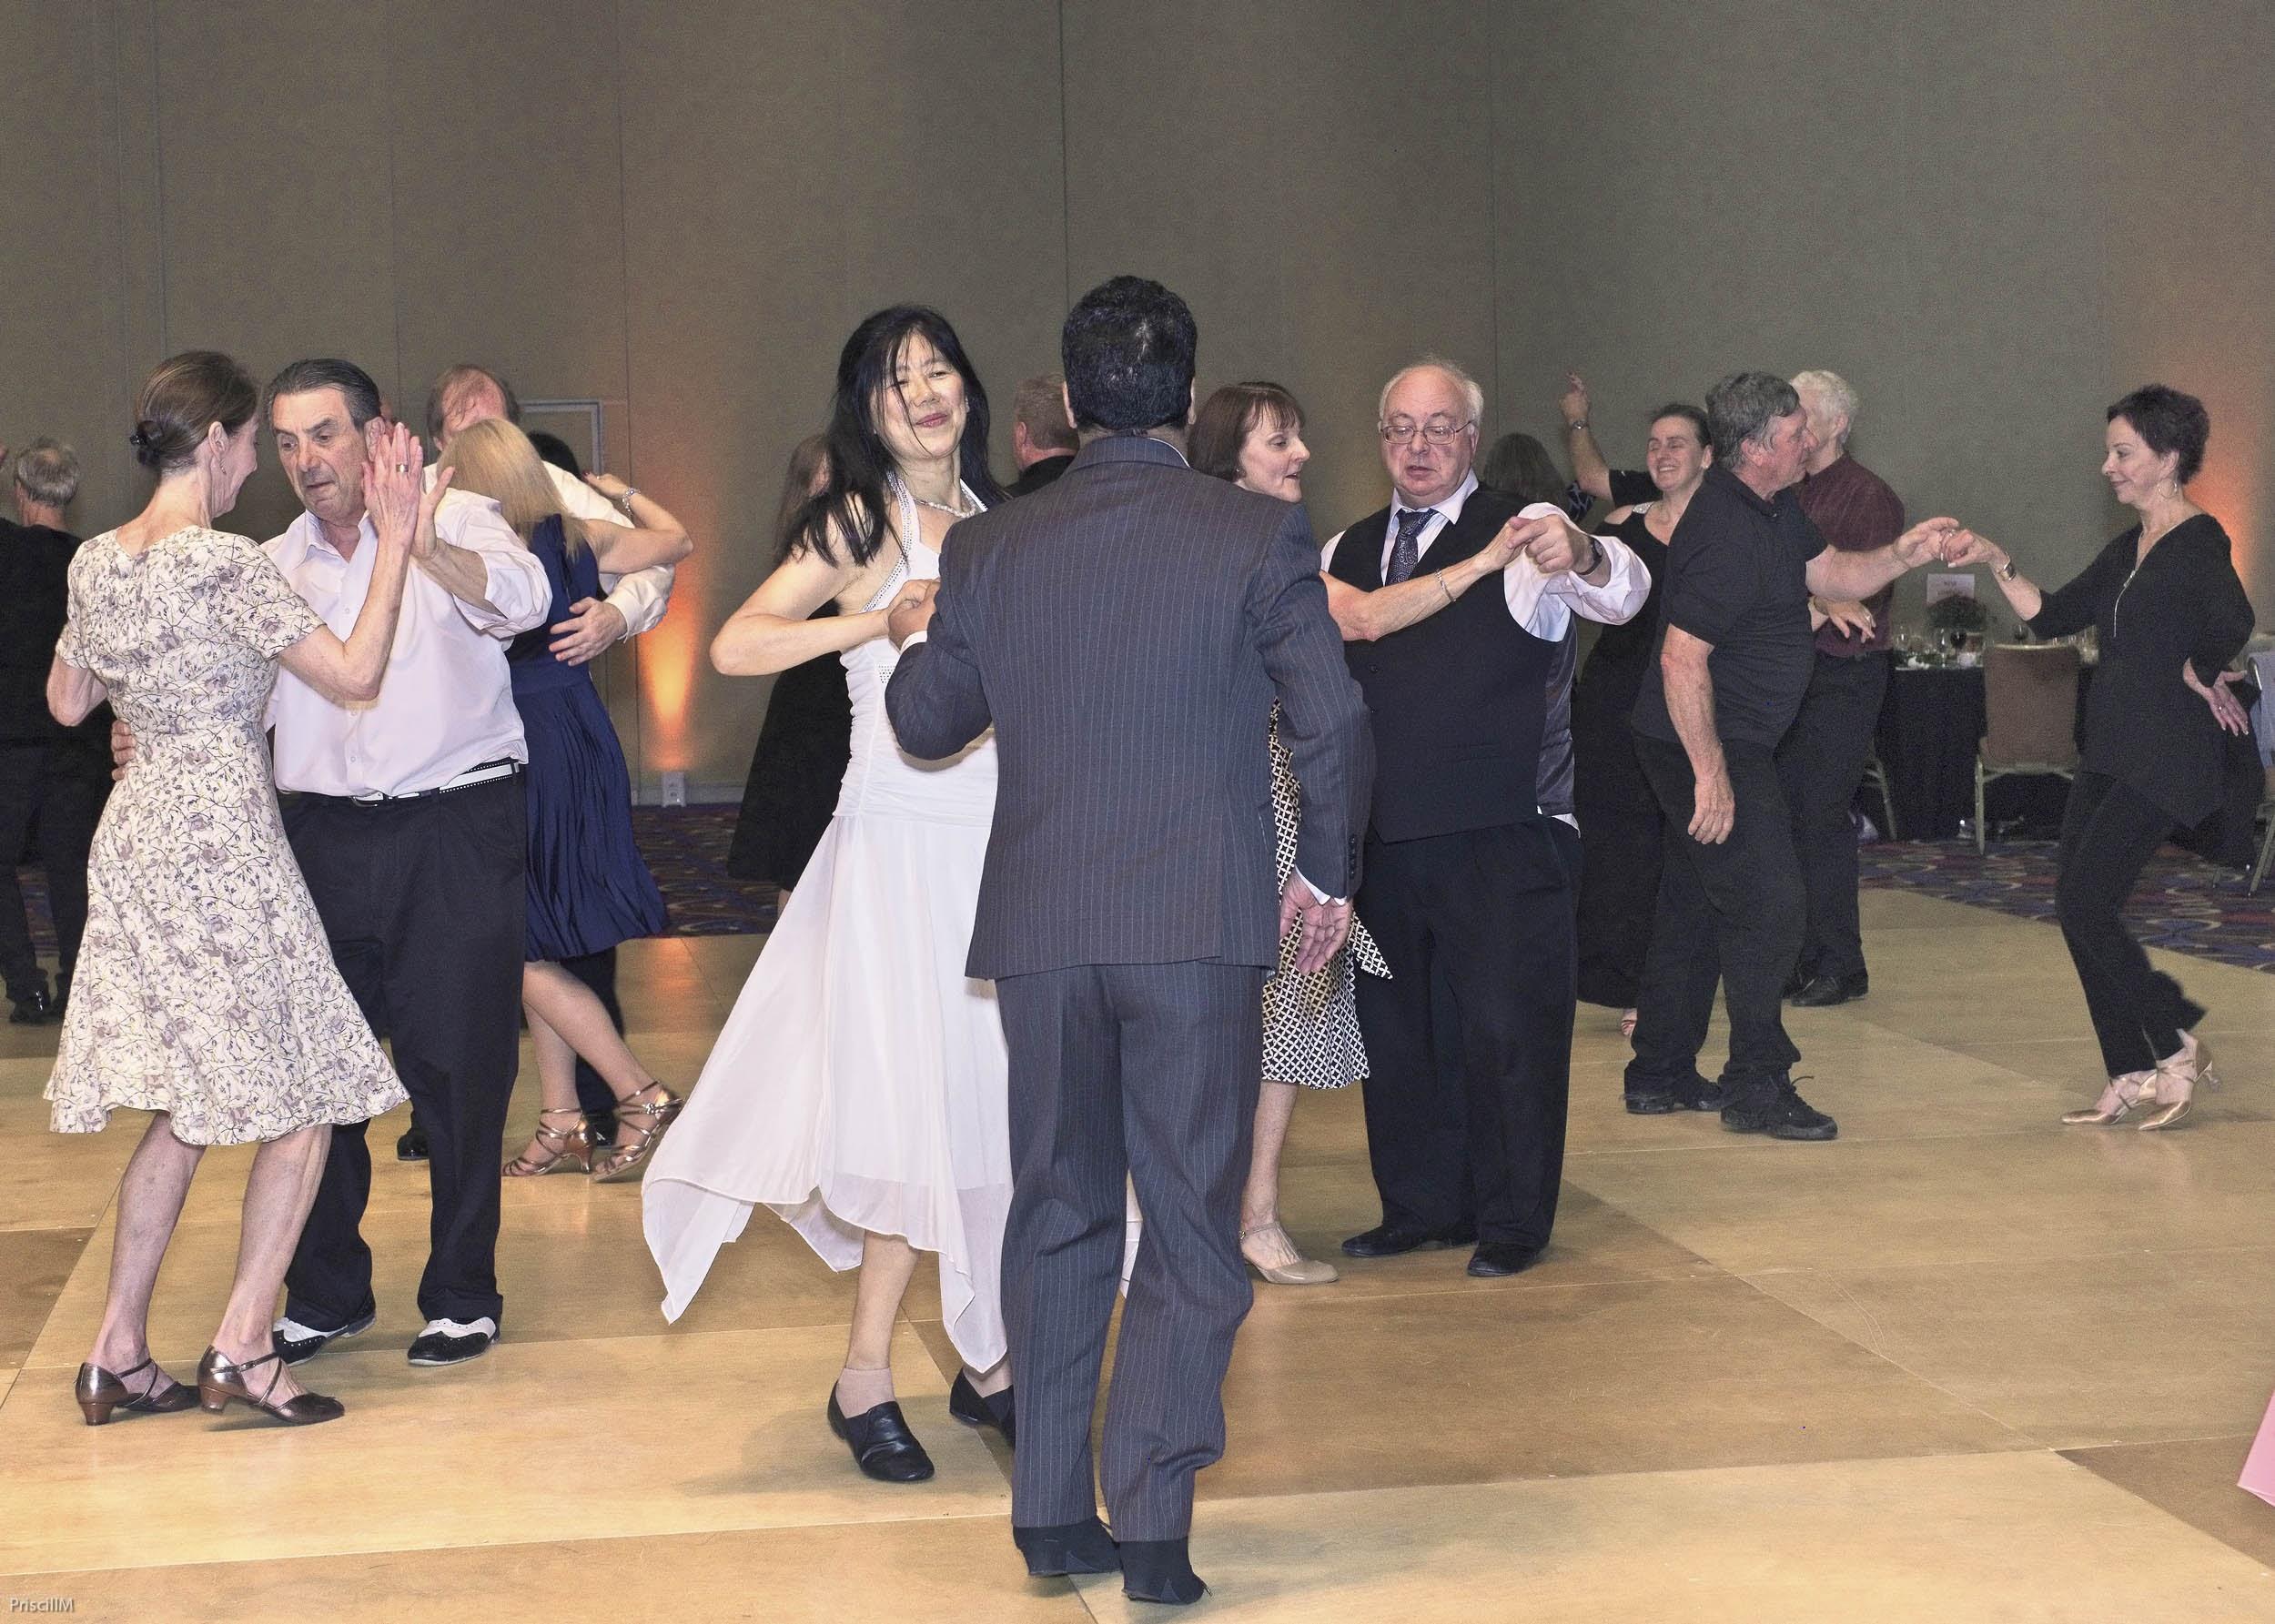 USA Dance Regional Fall Social-Dancers 1